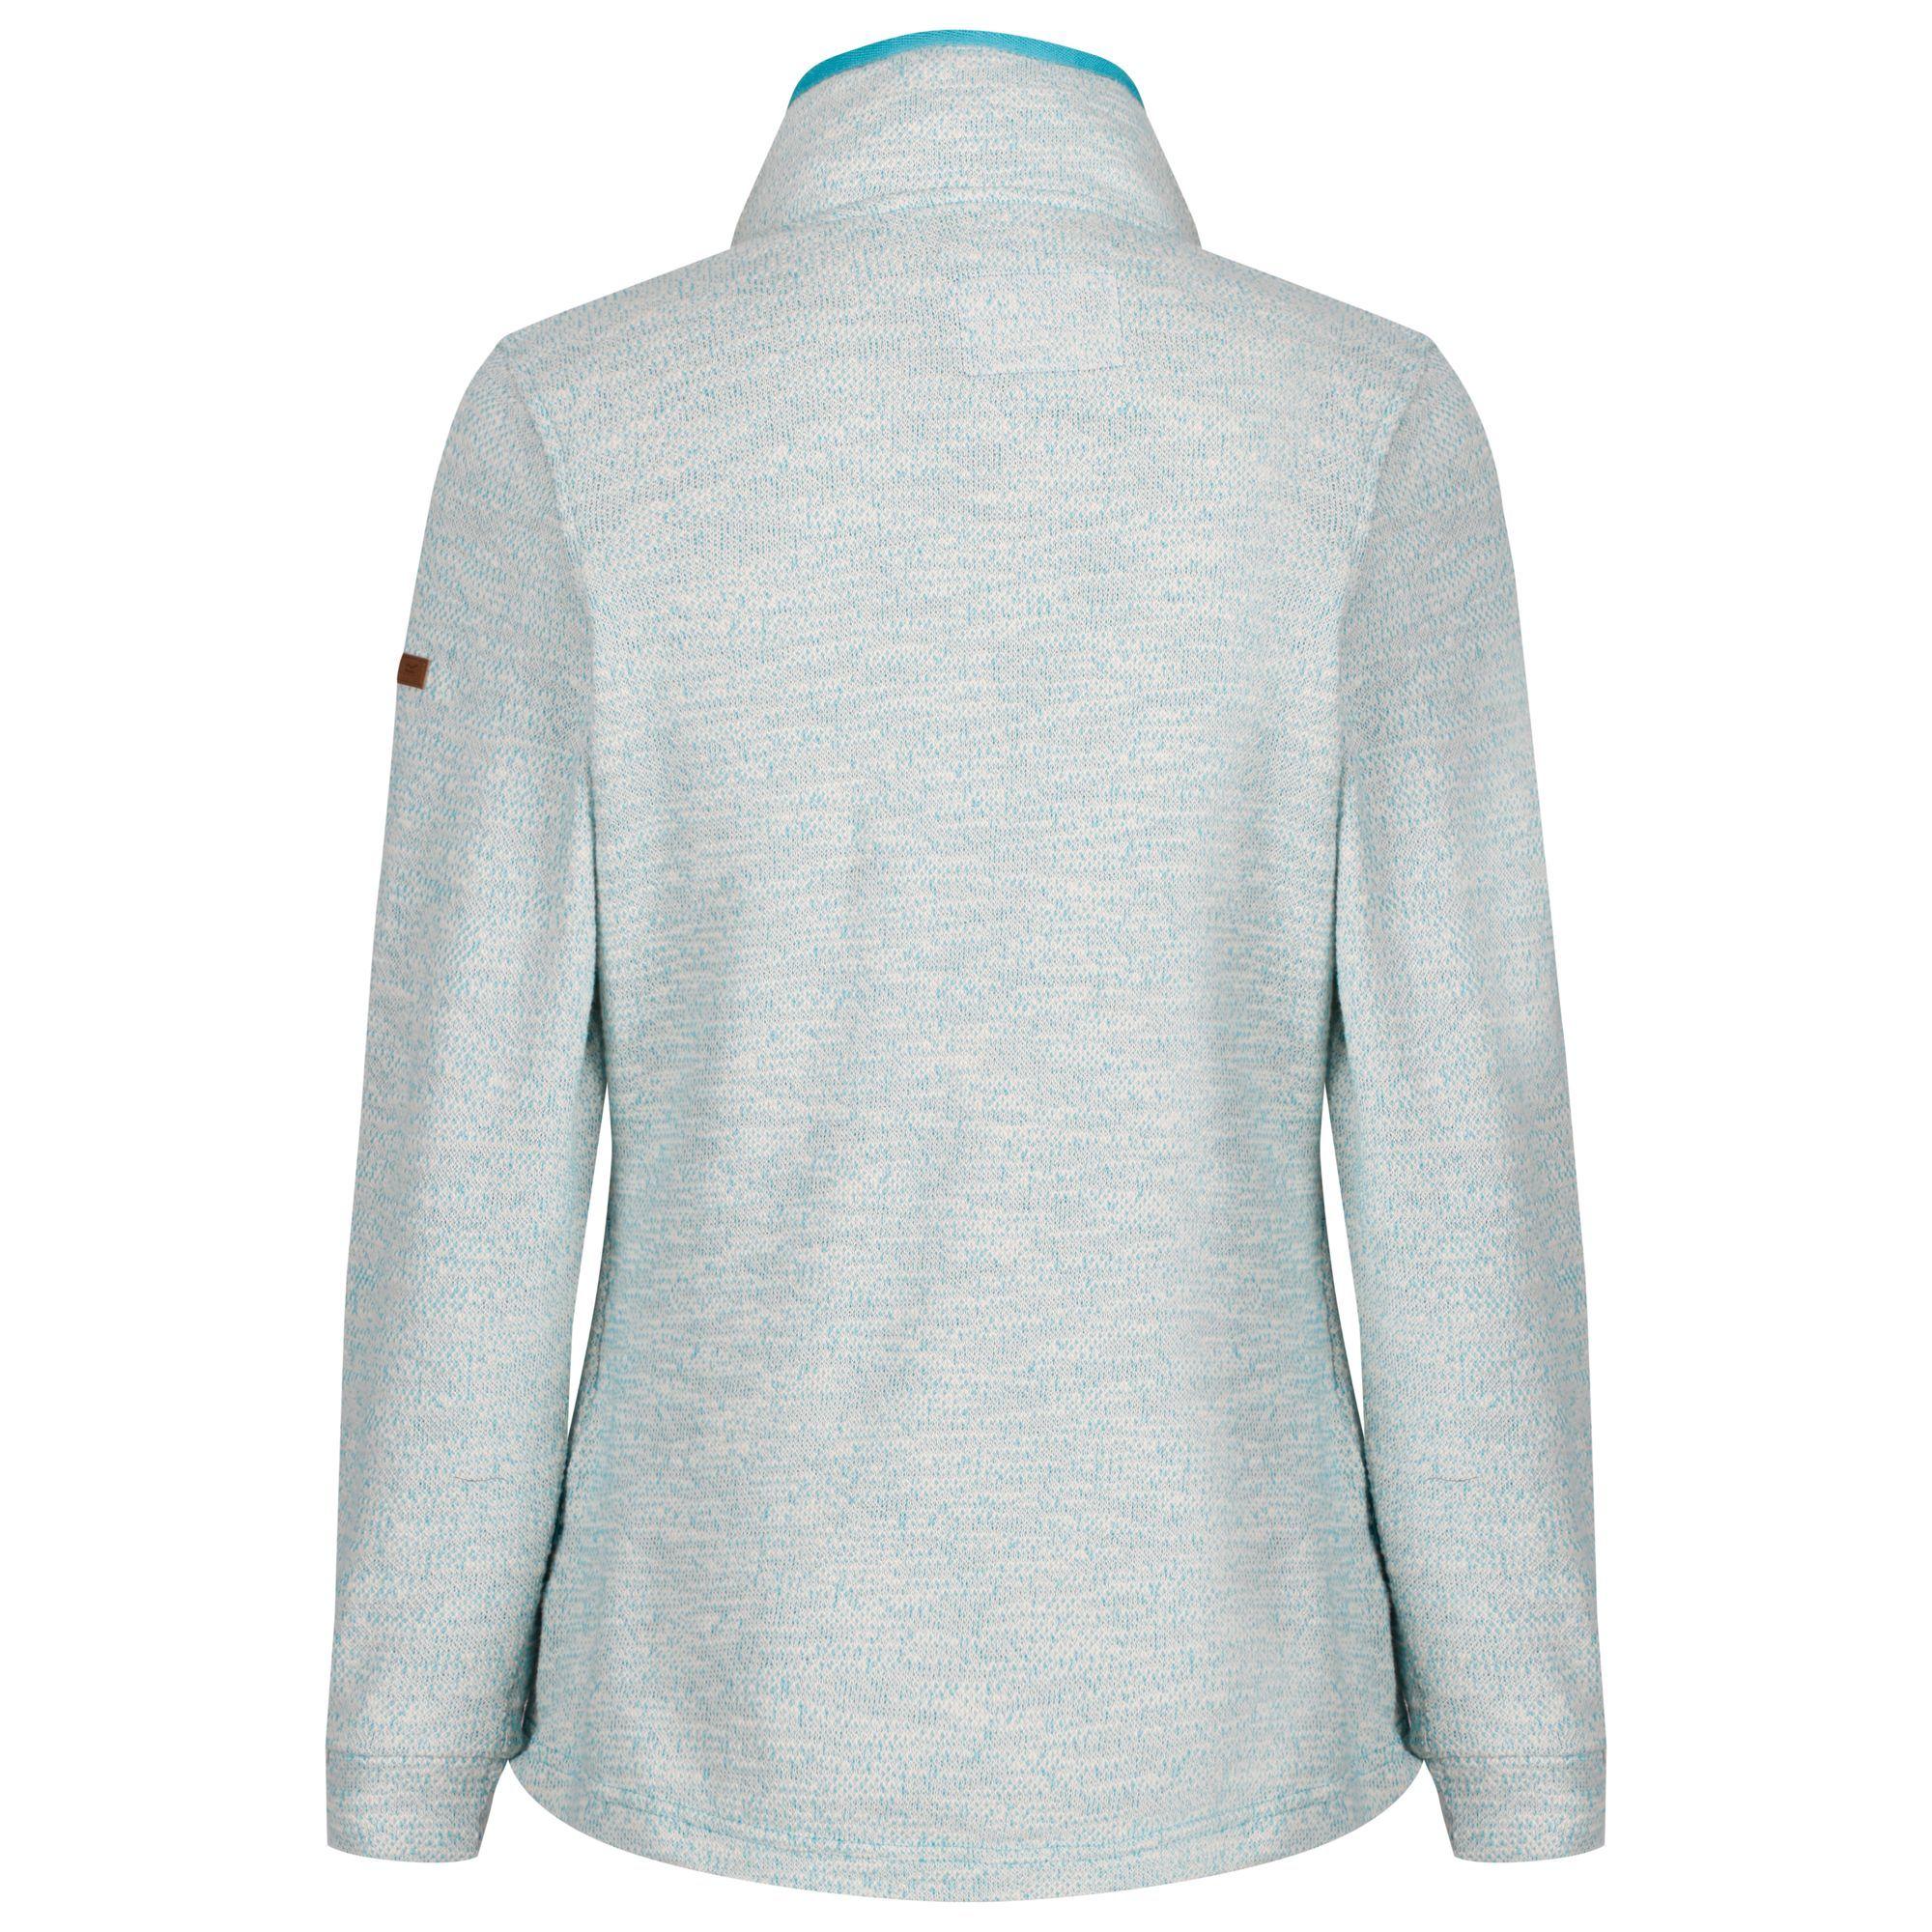 Regatta-Odetta-Womens-Warm-Curved-Full-Zip-Fleece-Jacket-RRP-50 thumbnail 5